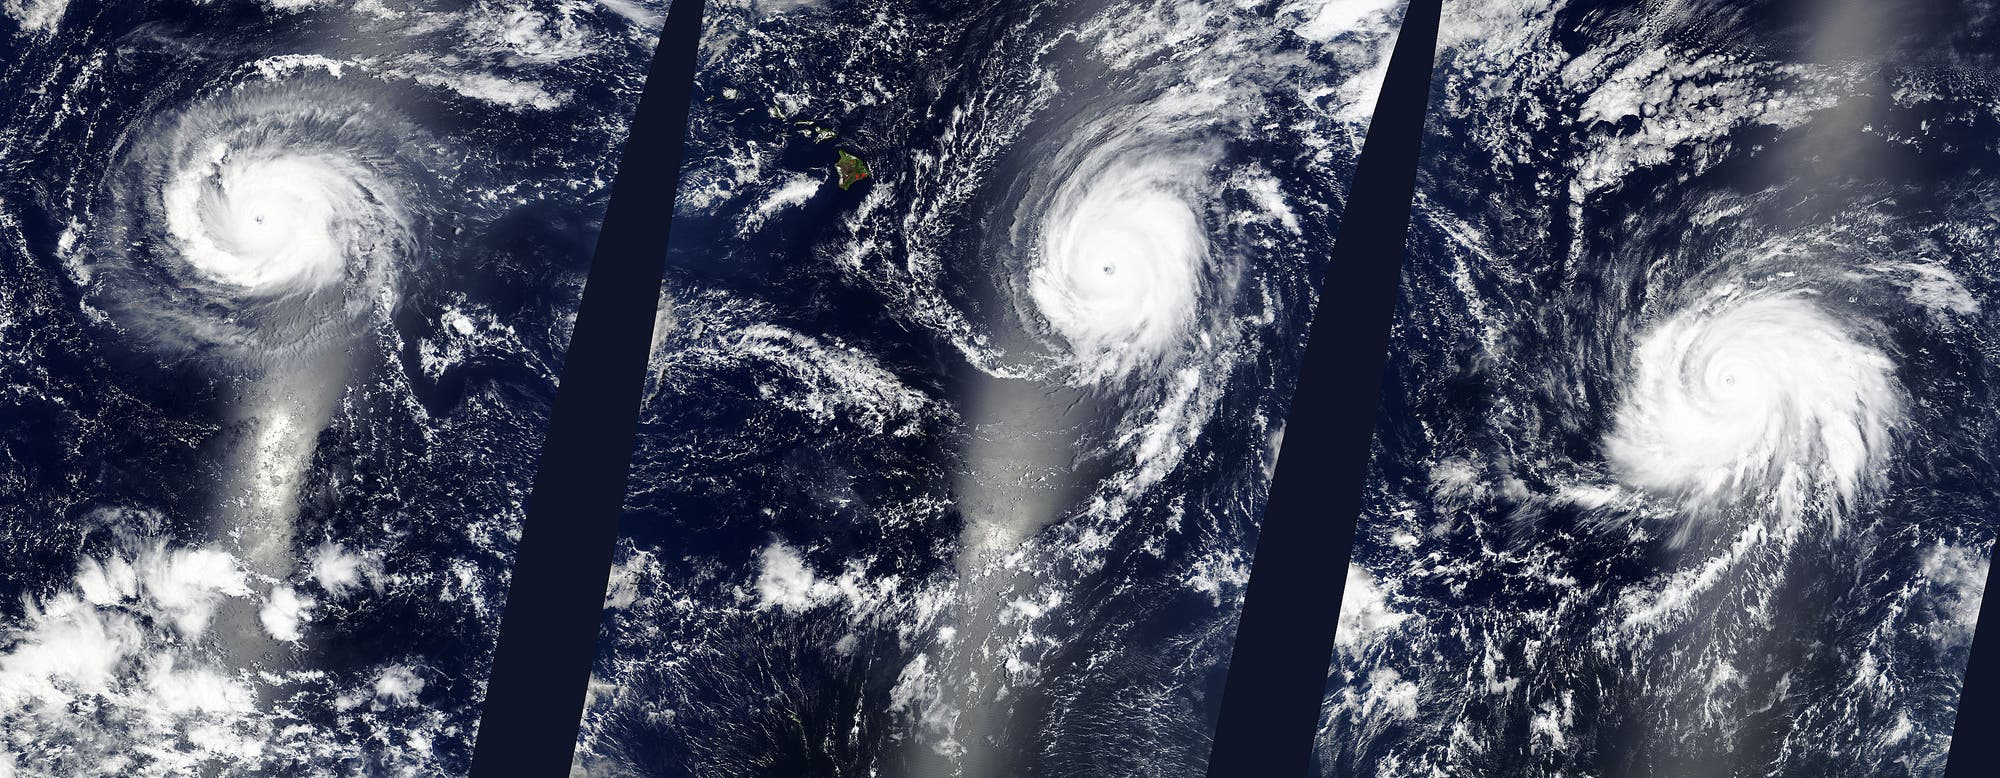 Die Hurrikane Kilo, Ignacio und Jimena im Infraroten